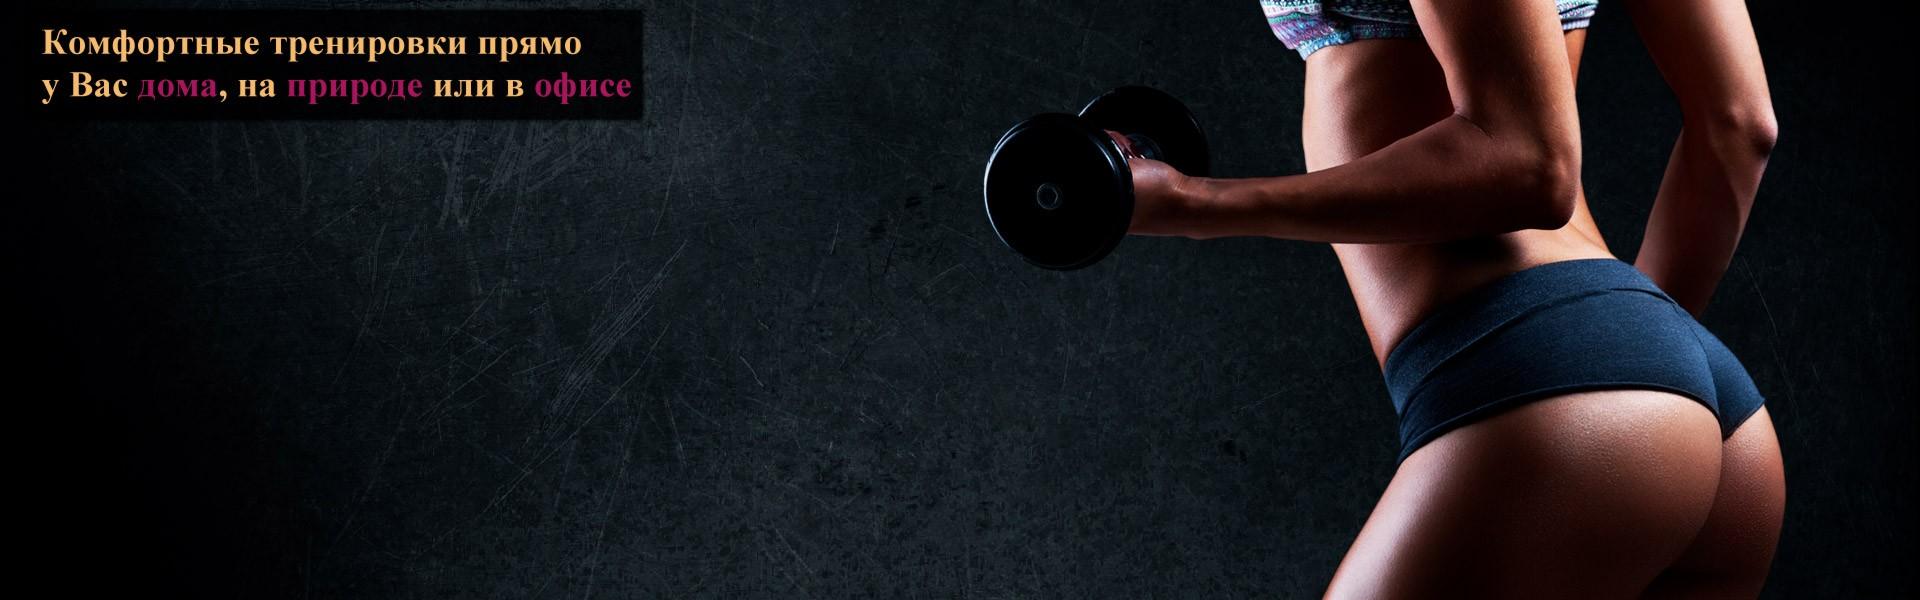 fitnessgo slider ru